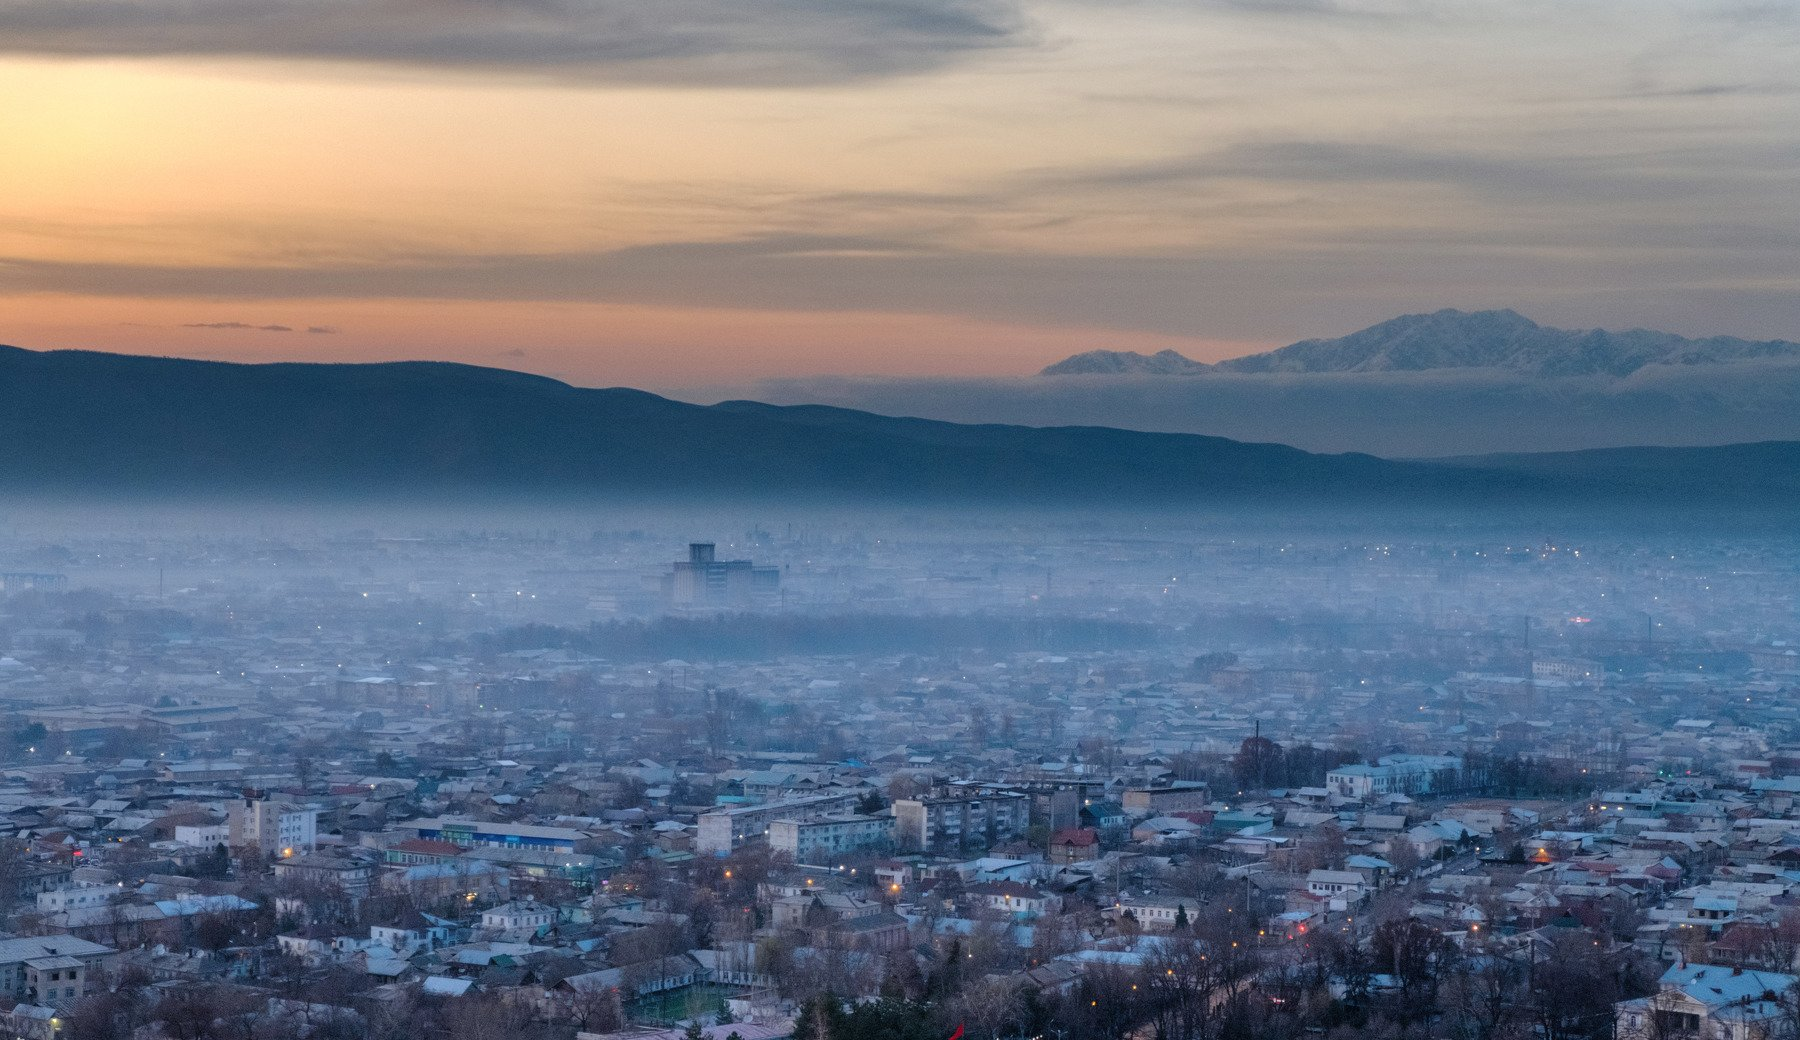 cityscape, город, городской пейзаж, кыргызстан, киргизия,, Марат Сайранбаев